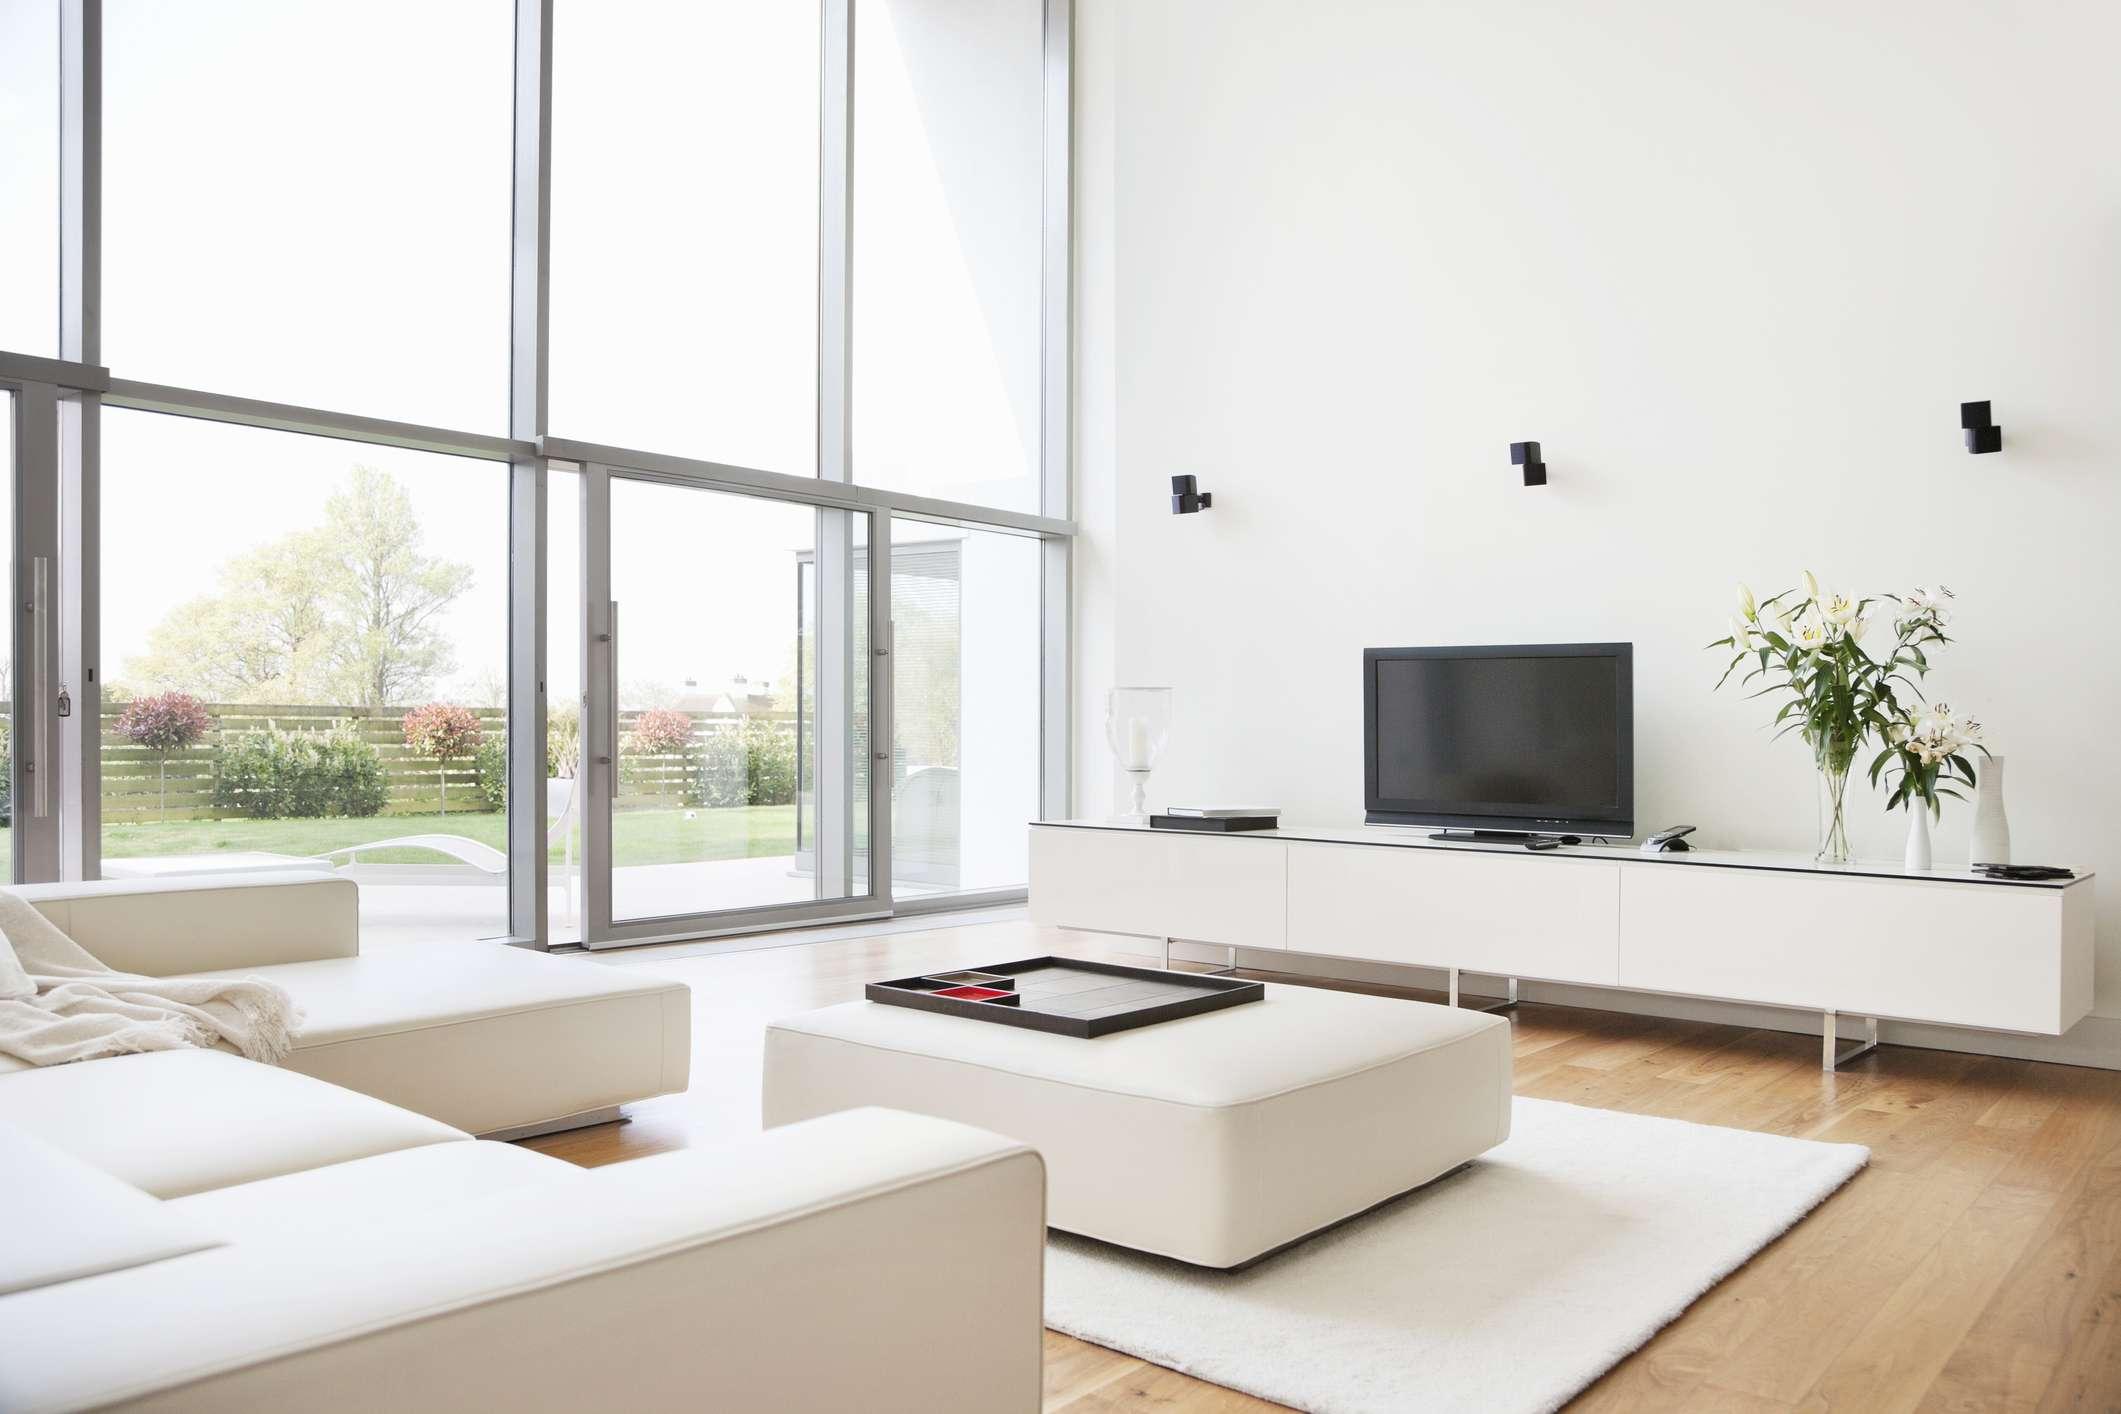 A white sofa in a modern living room